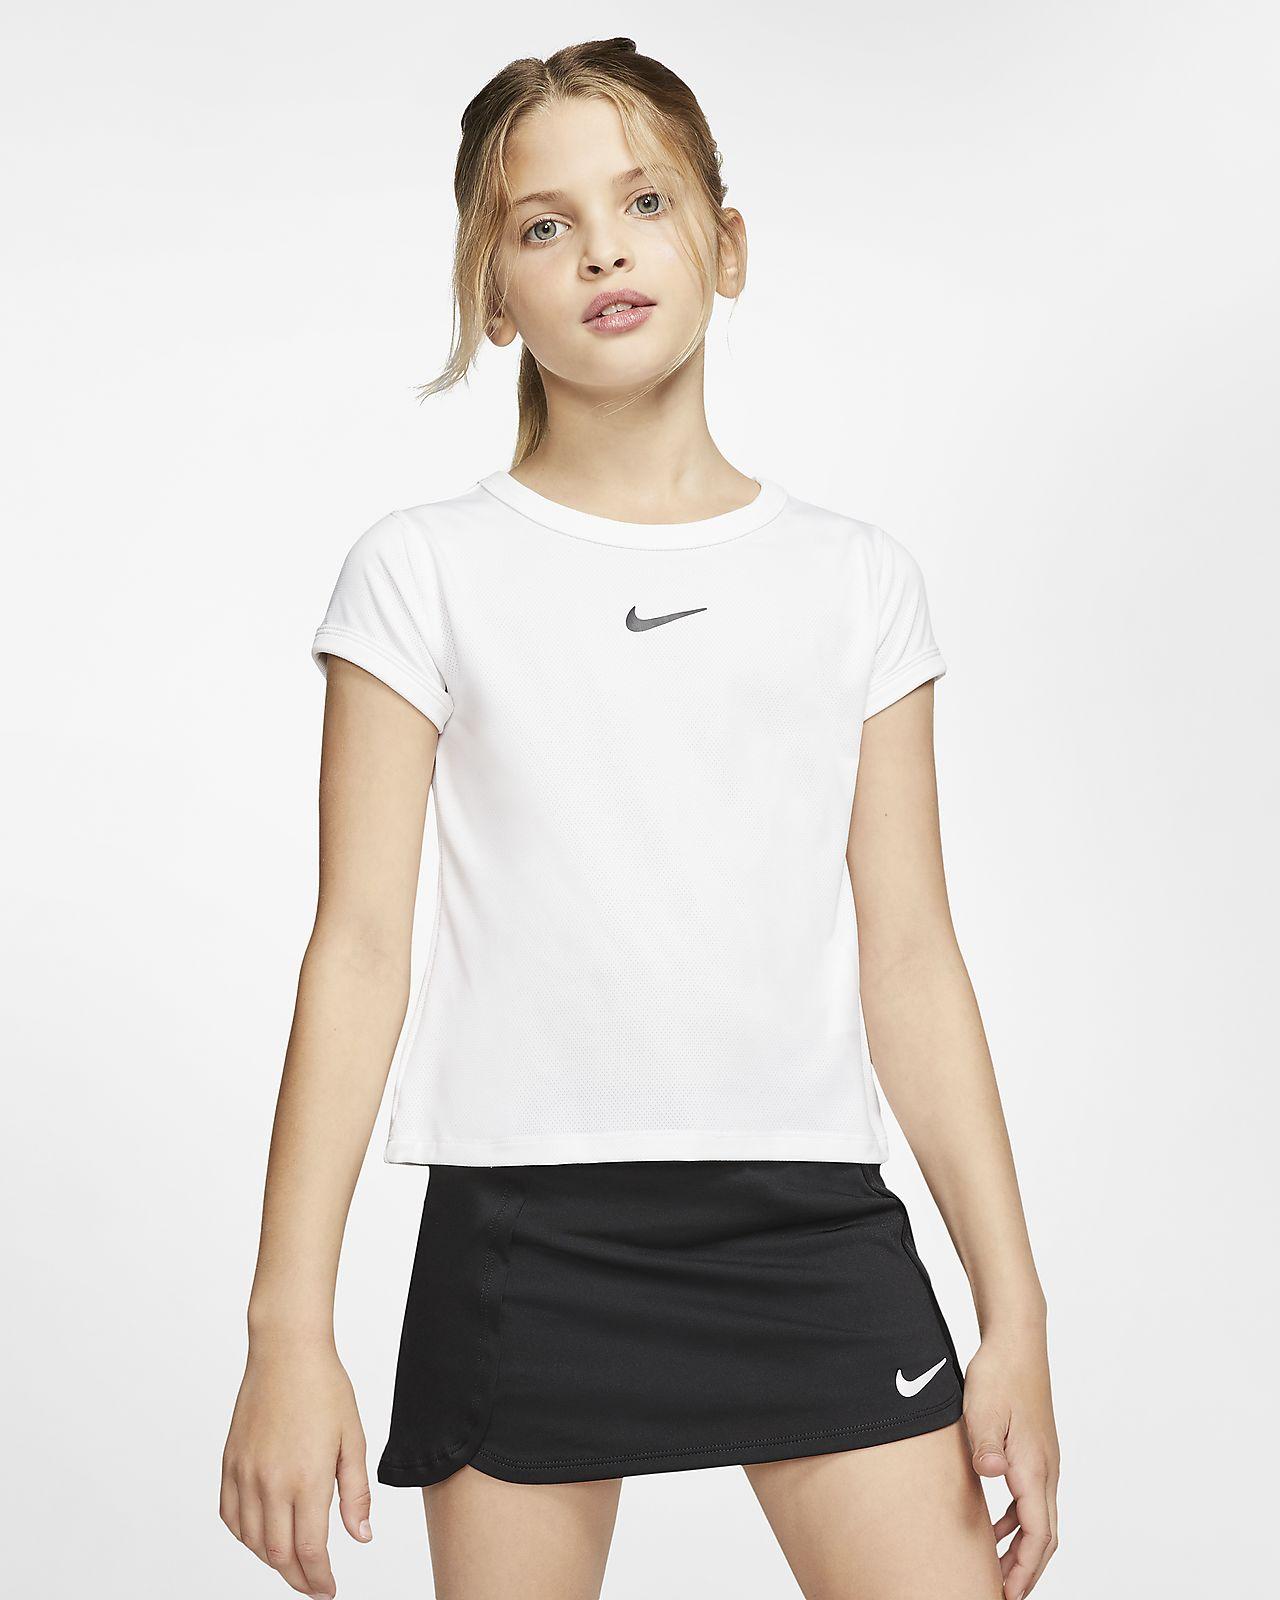 Prenda para la parte superior de tenis para niña NikeCourt Dri-FIT